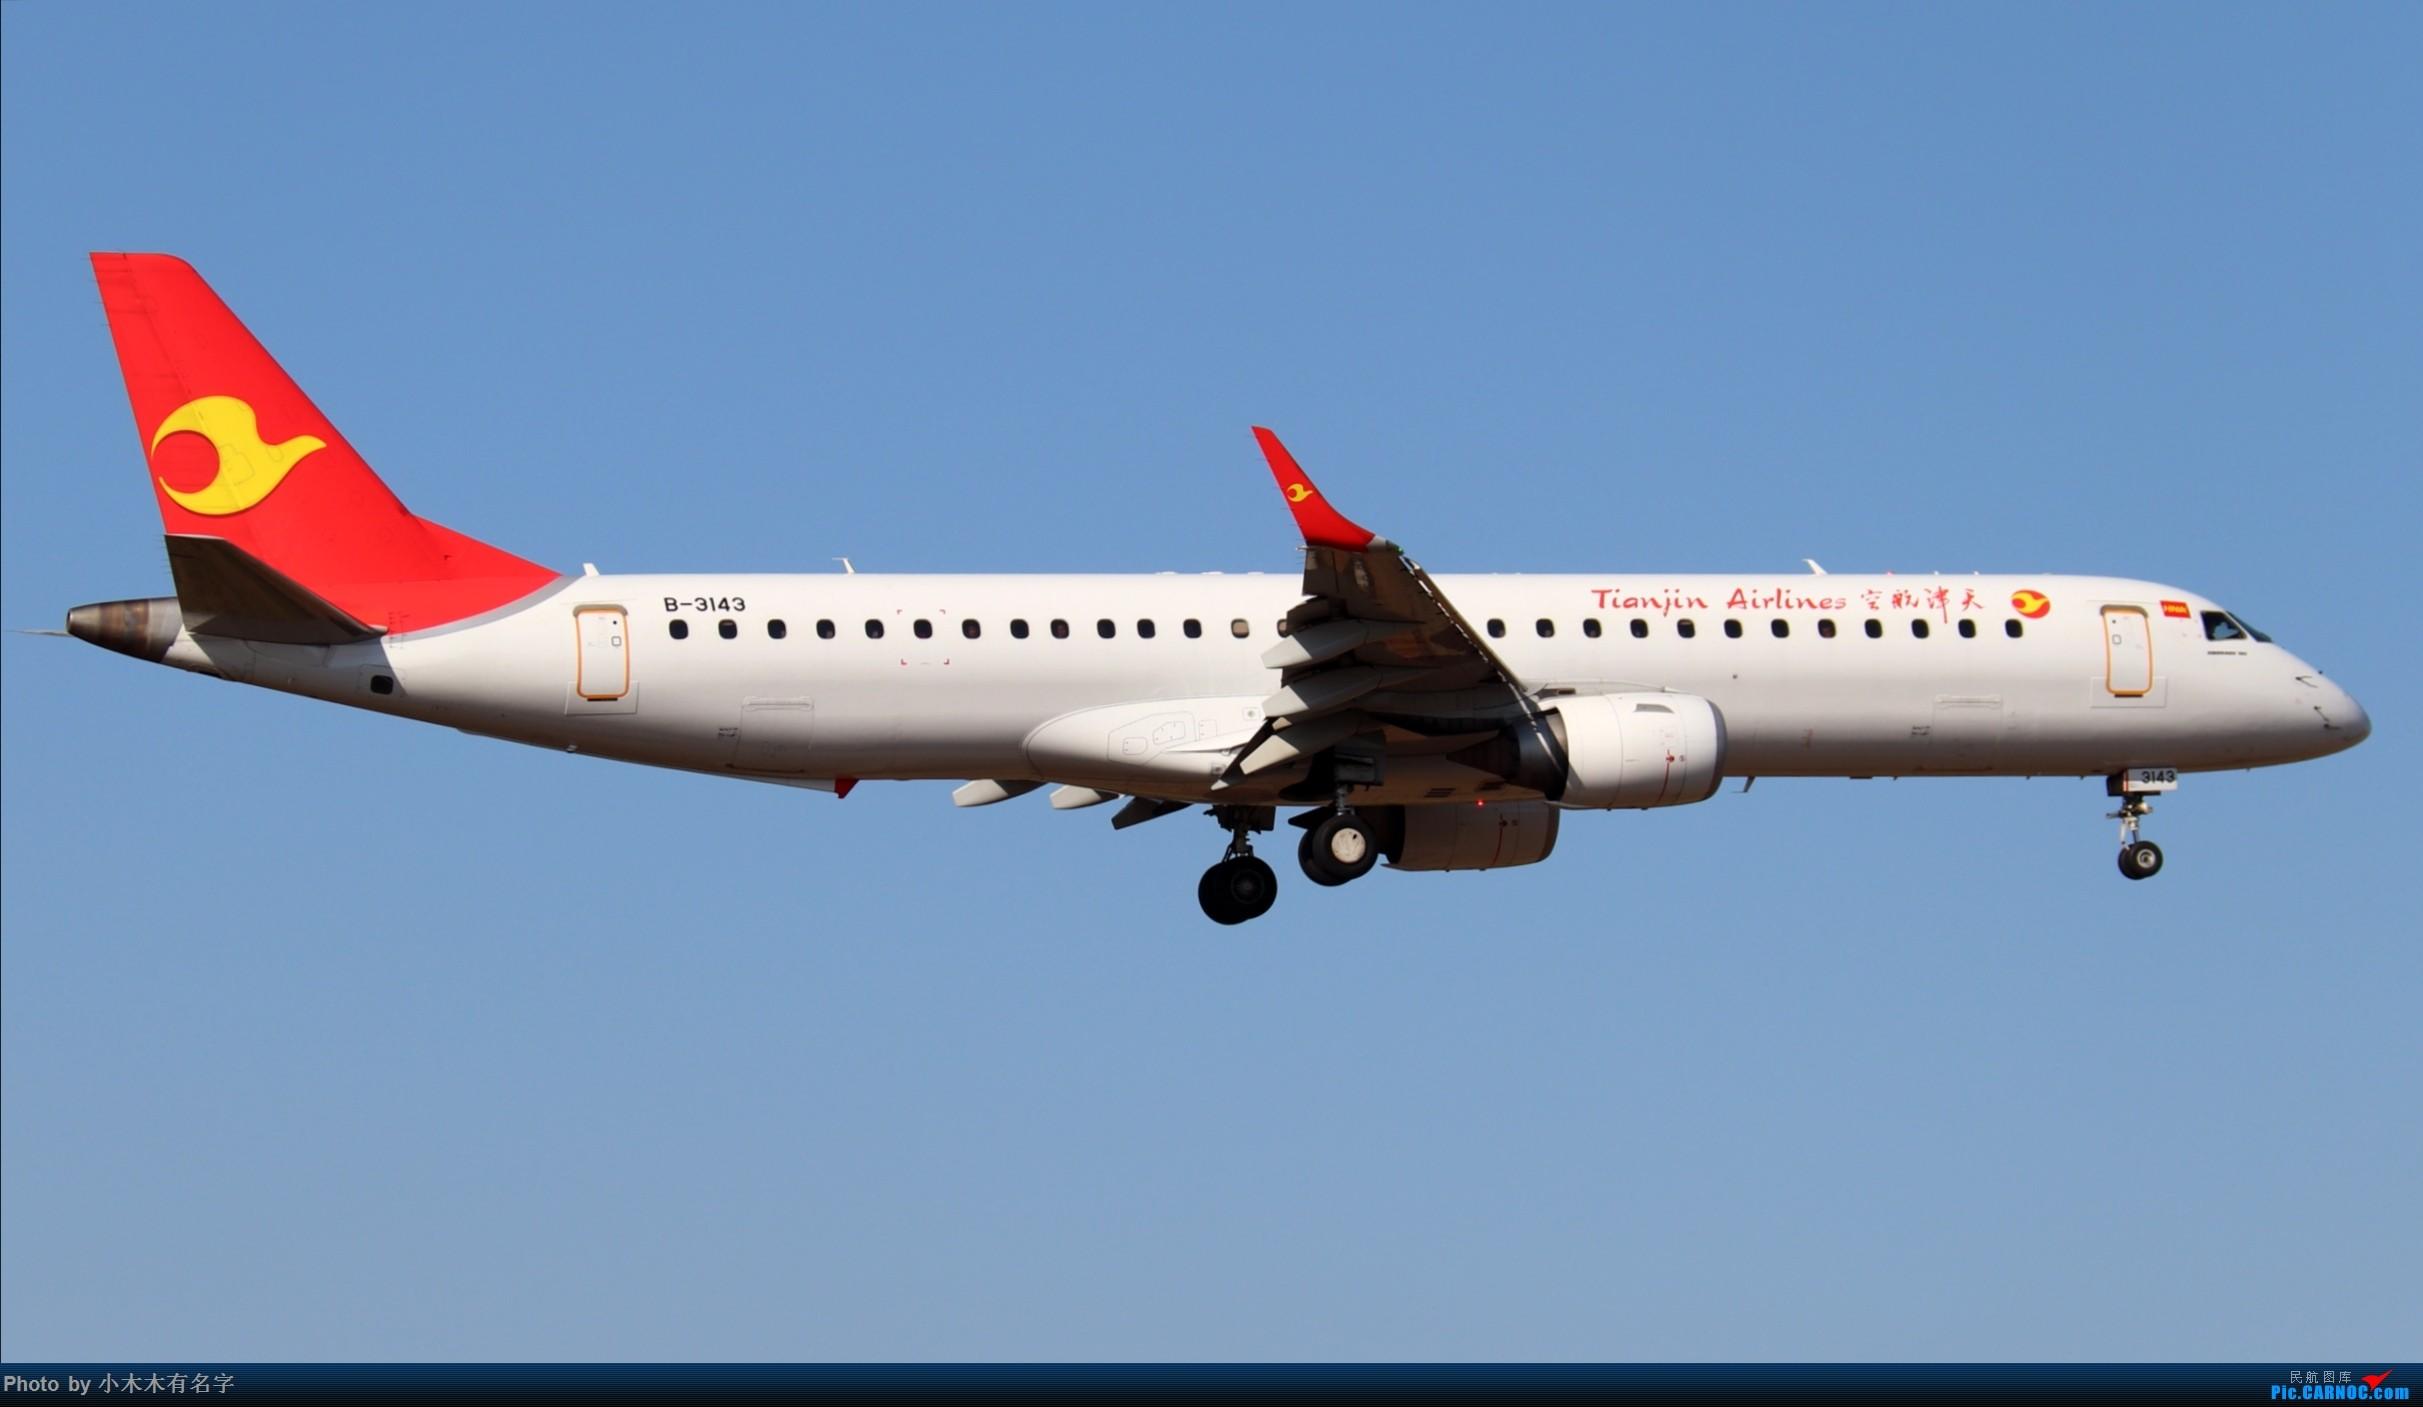 Re:[原创]2019冬天的海口美兰 EMBRAER E-195 B-3143 中国海口美兰国际机场